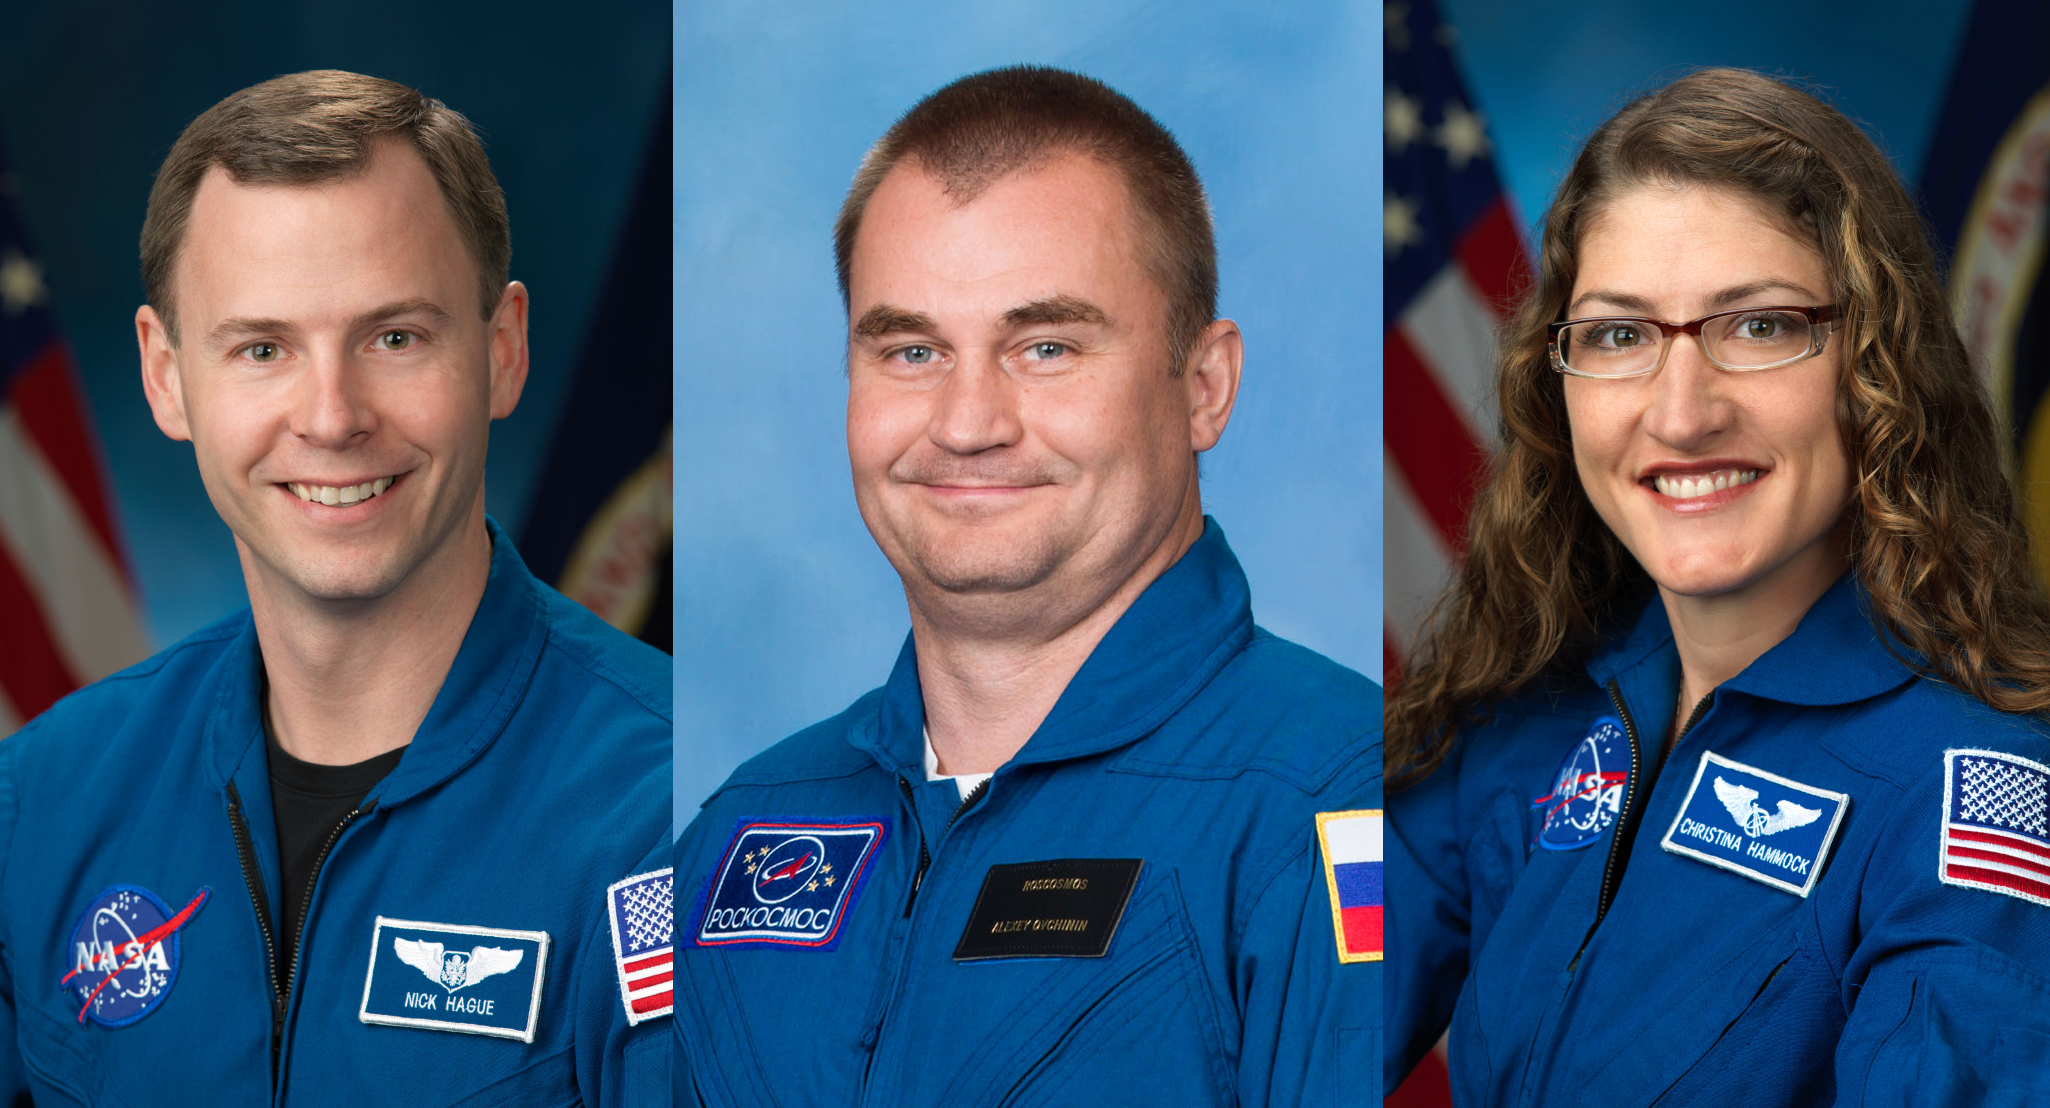 The Soyuz MS-12 crew. From left to right: NASA astronaut Nick Hague, Russian cosmonaut Aleksey Ovchinin and NASA astronaut Christina Koch. Credit: NASA